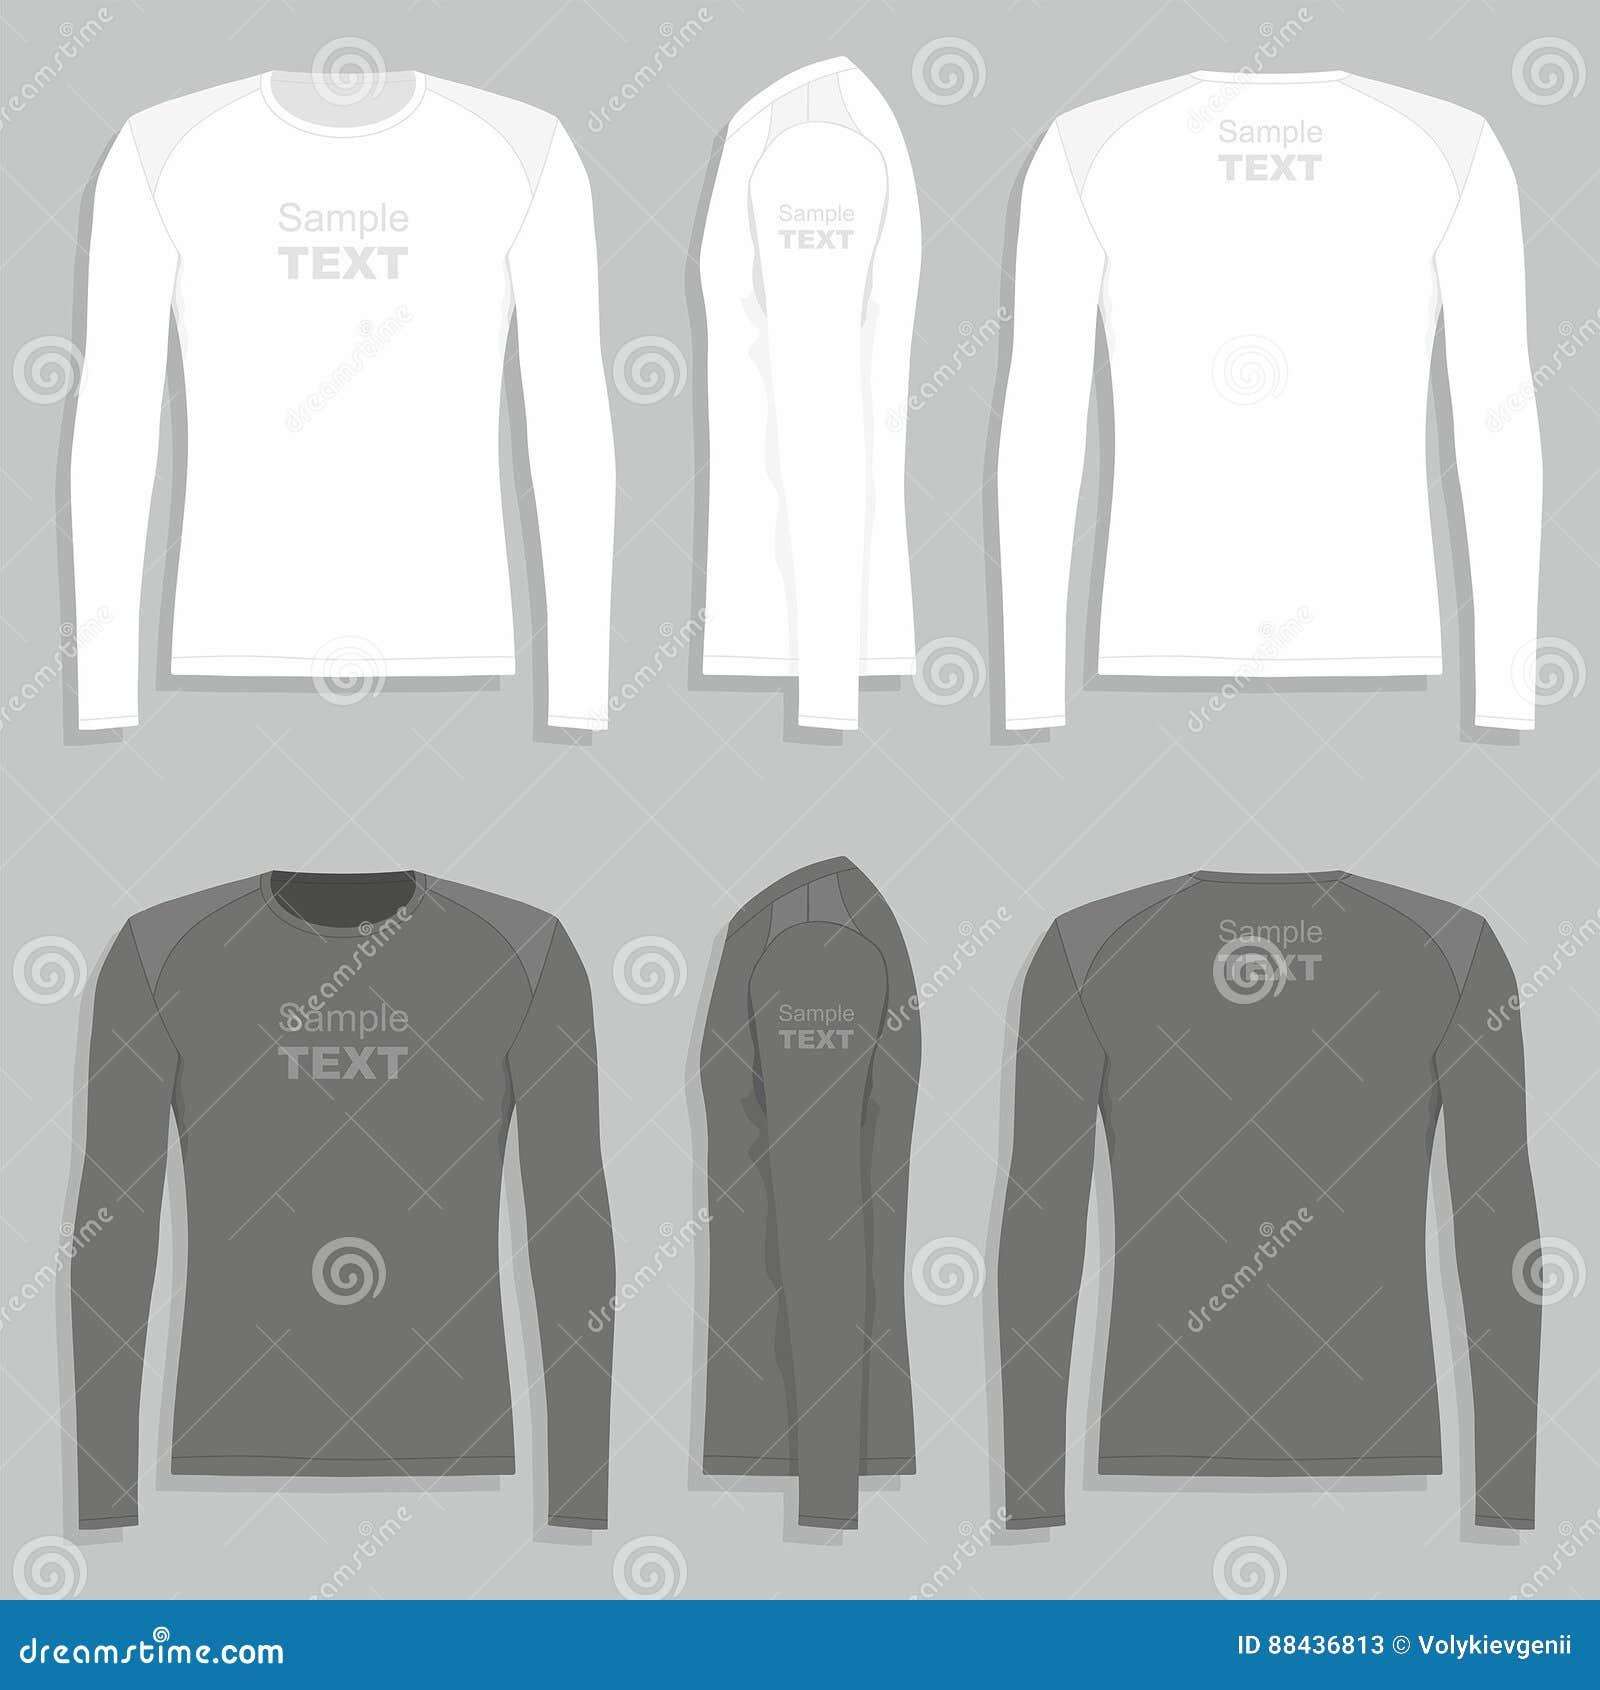 cc5d5721e686e6 Männer ` S Langärmliges T-Shirt Vektor Abbildung - Illustration von ...